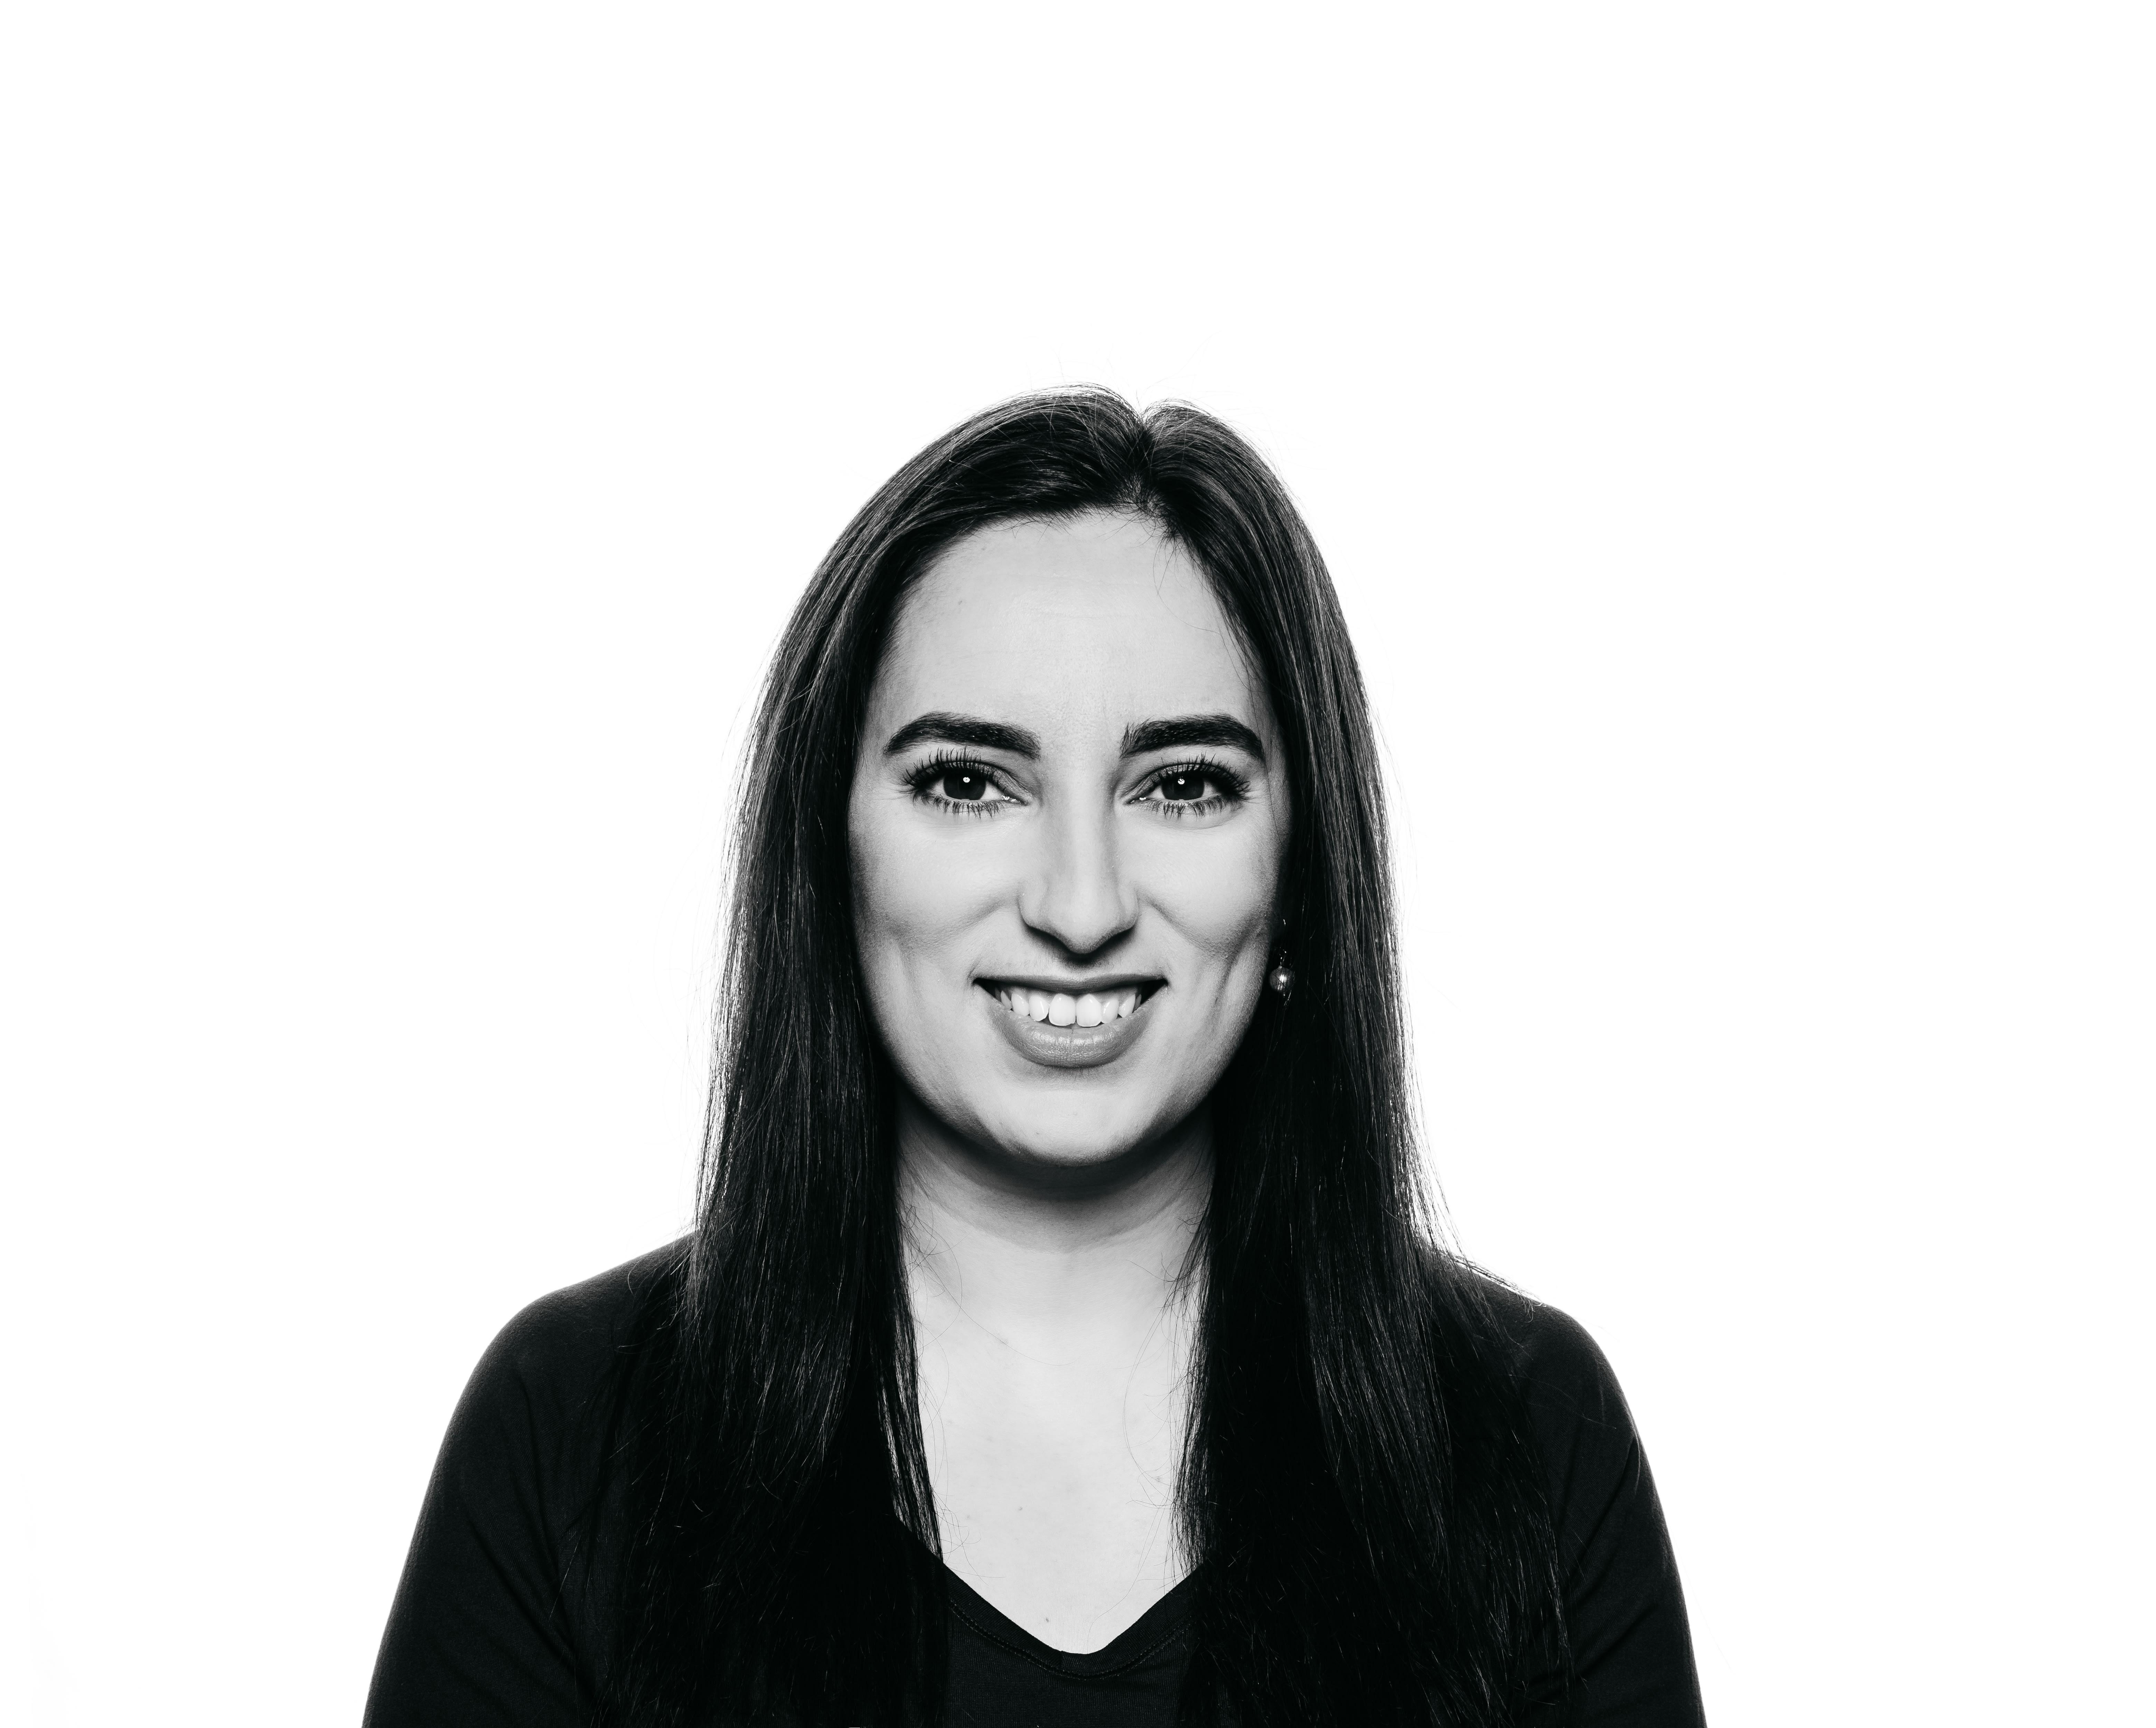 Sara Tayfeh Ramazanloo